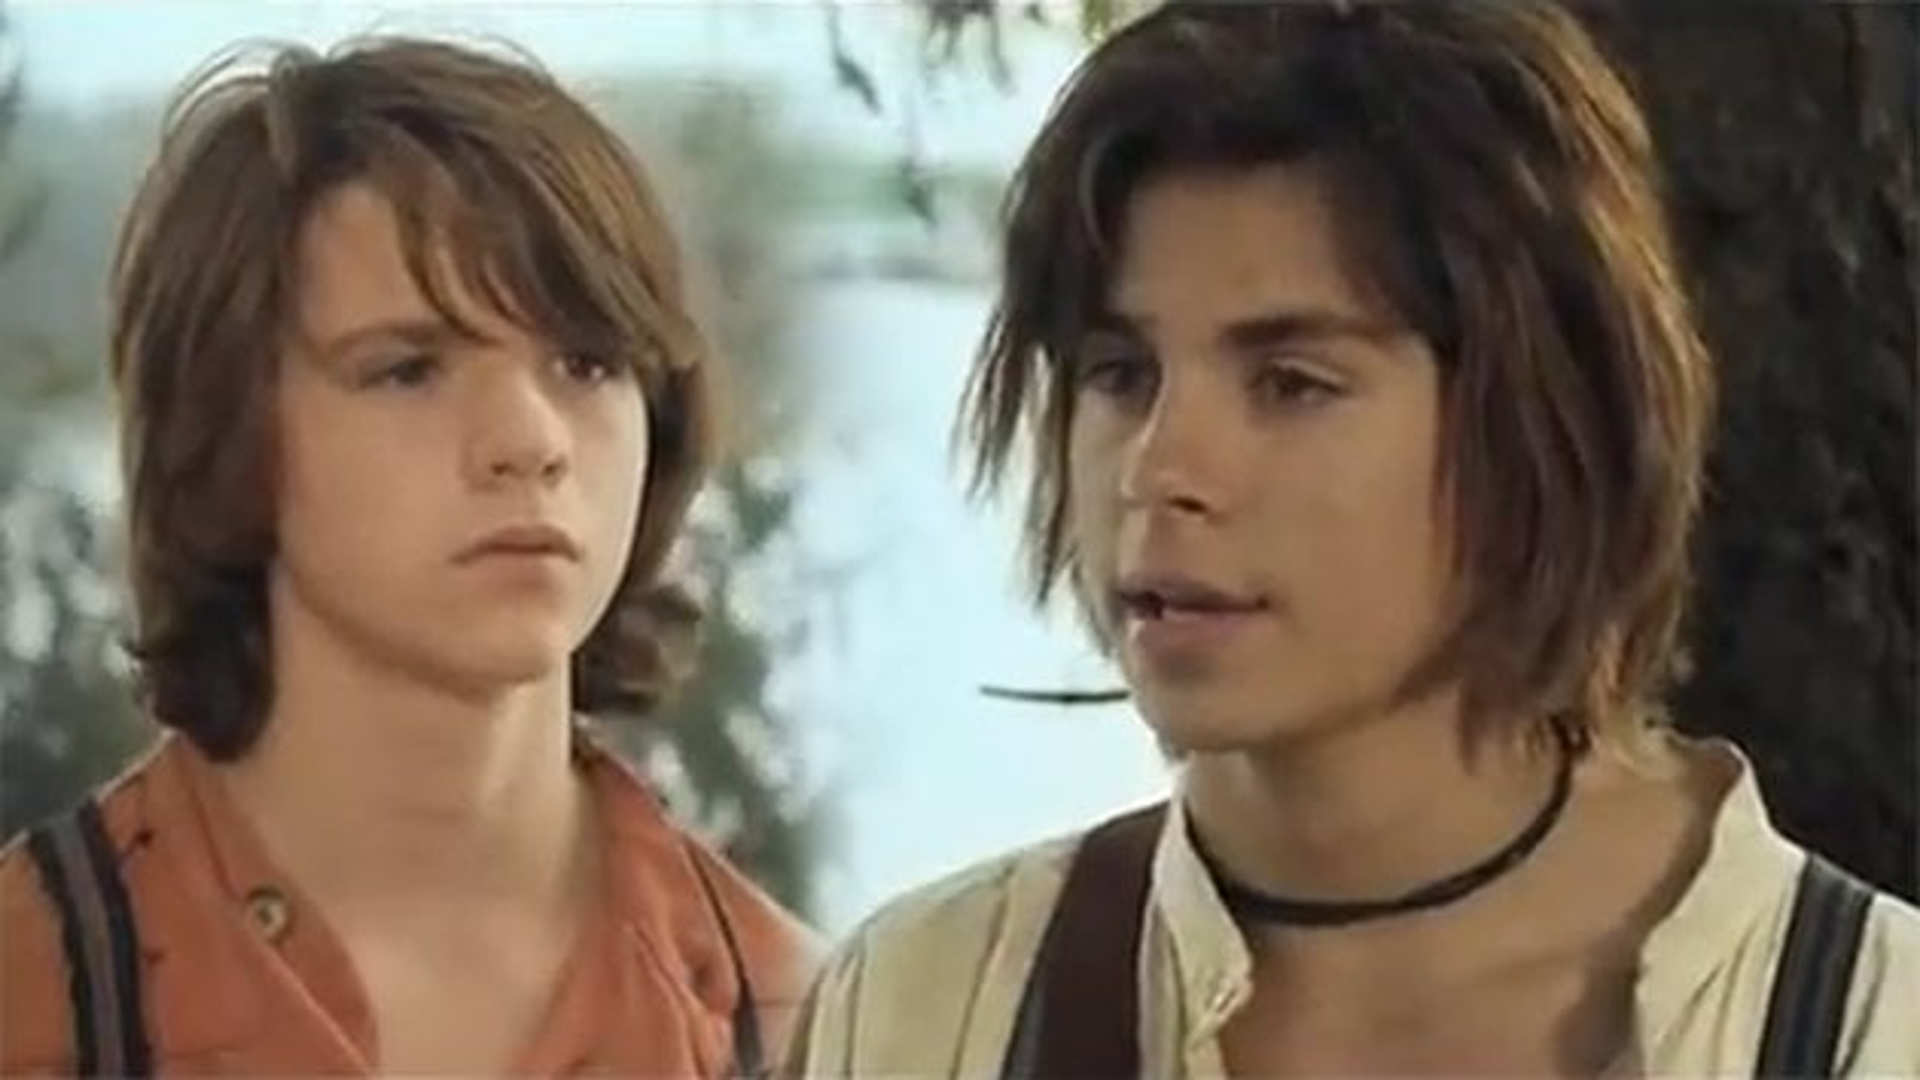 Tom-Sawyer-Huckleberry-Finn-Trailer-Jake-T-Austin